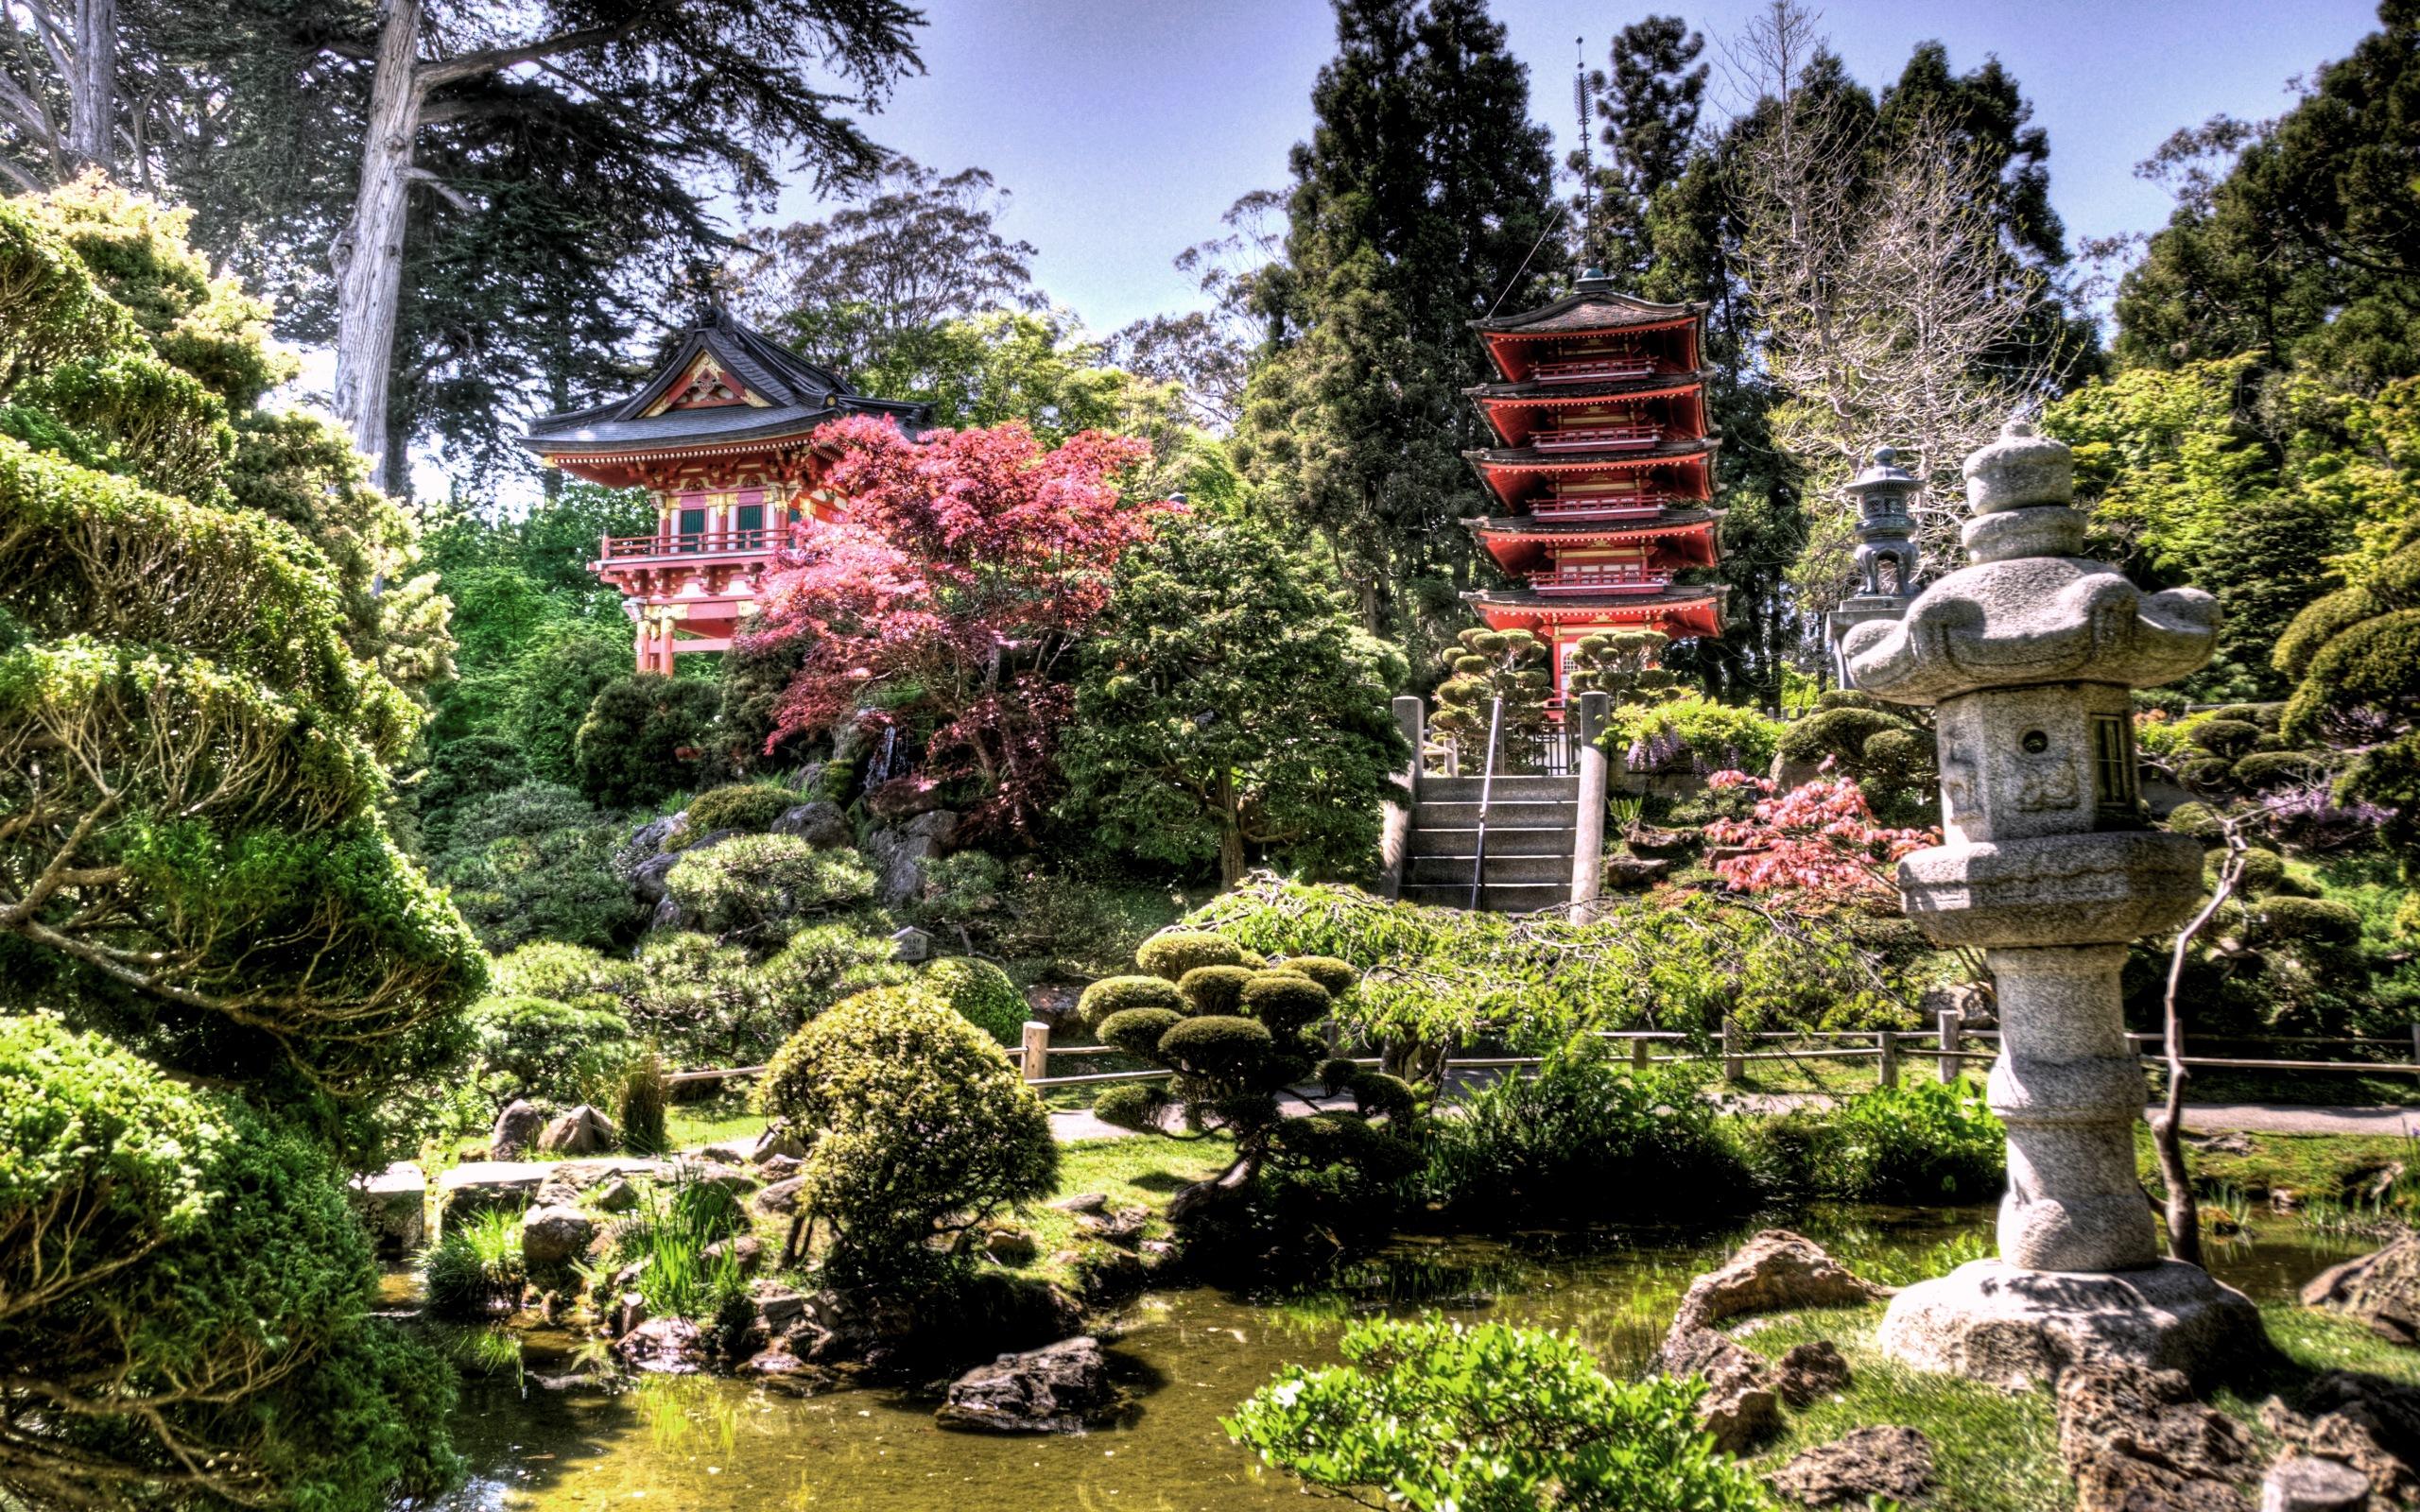 Japanese garden wallpaper - Japanese Tea Garden Desktop Wallpaper